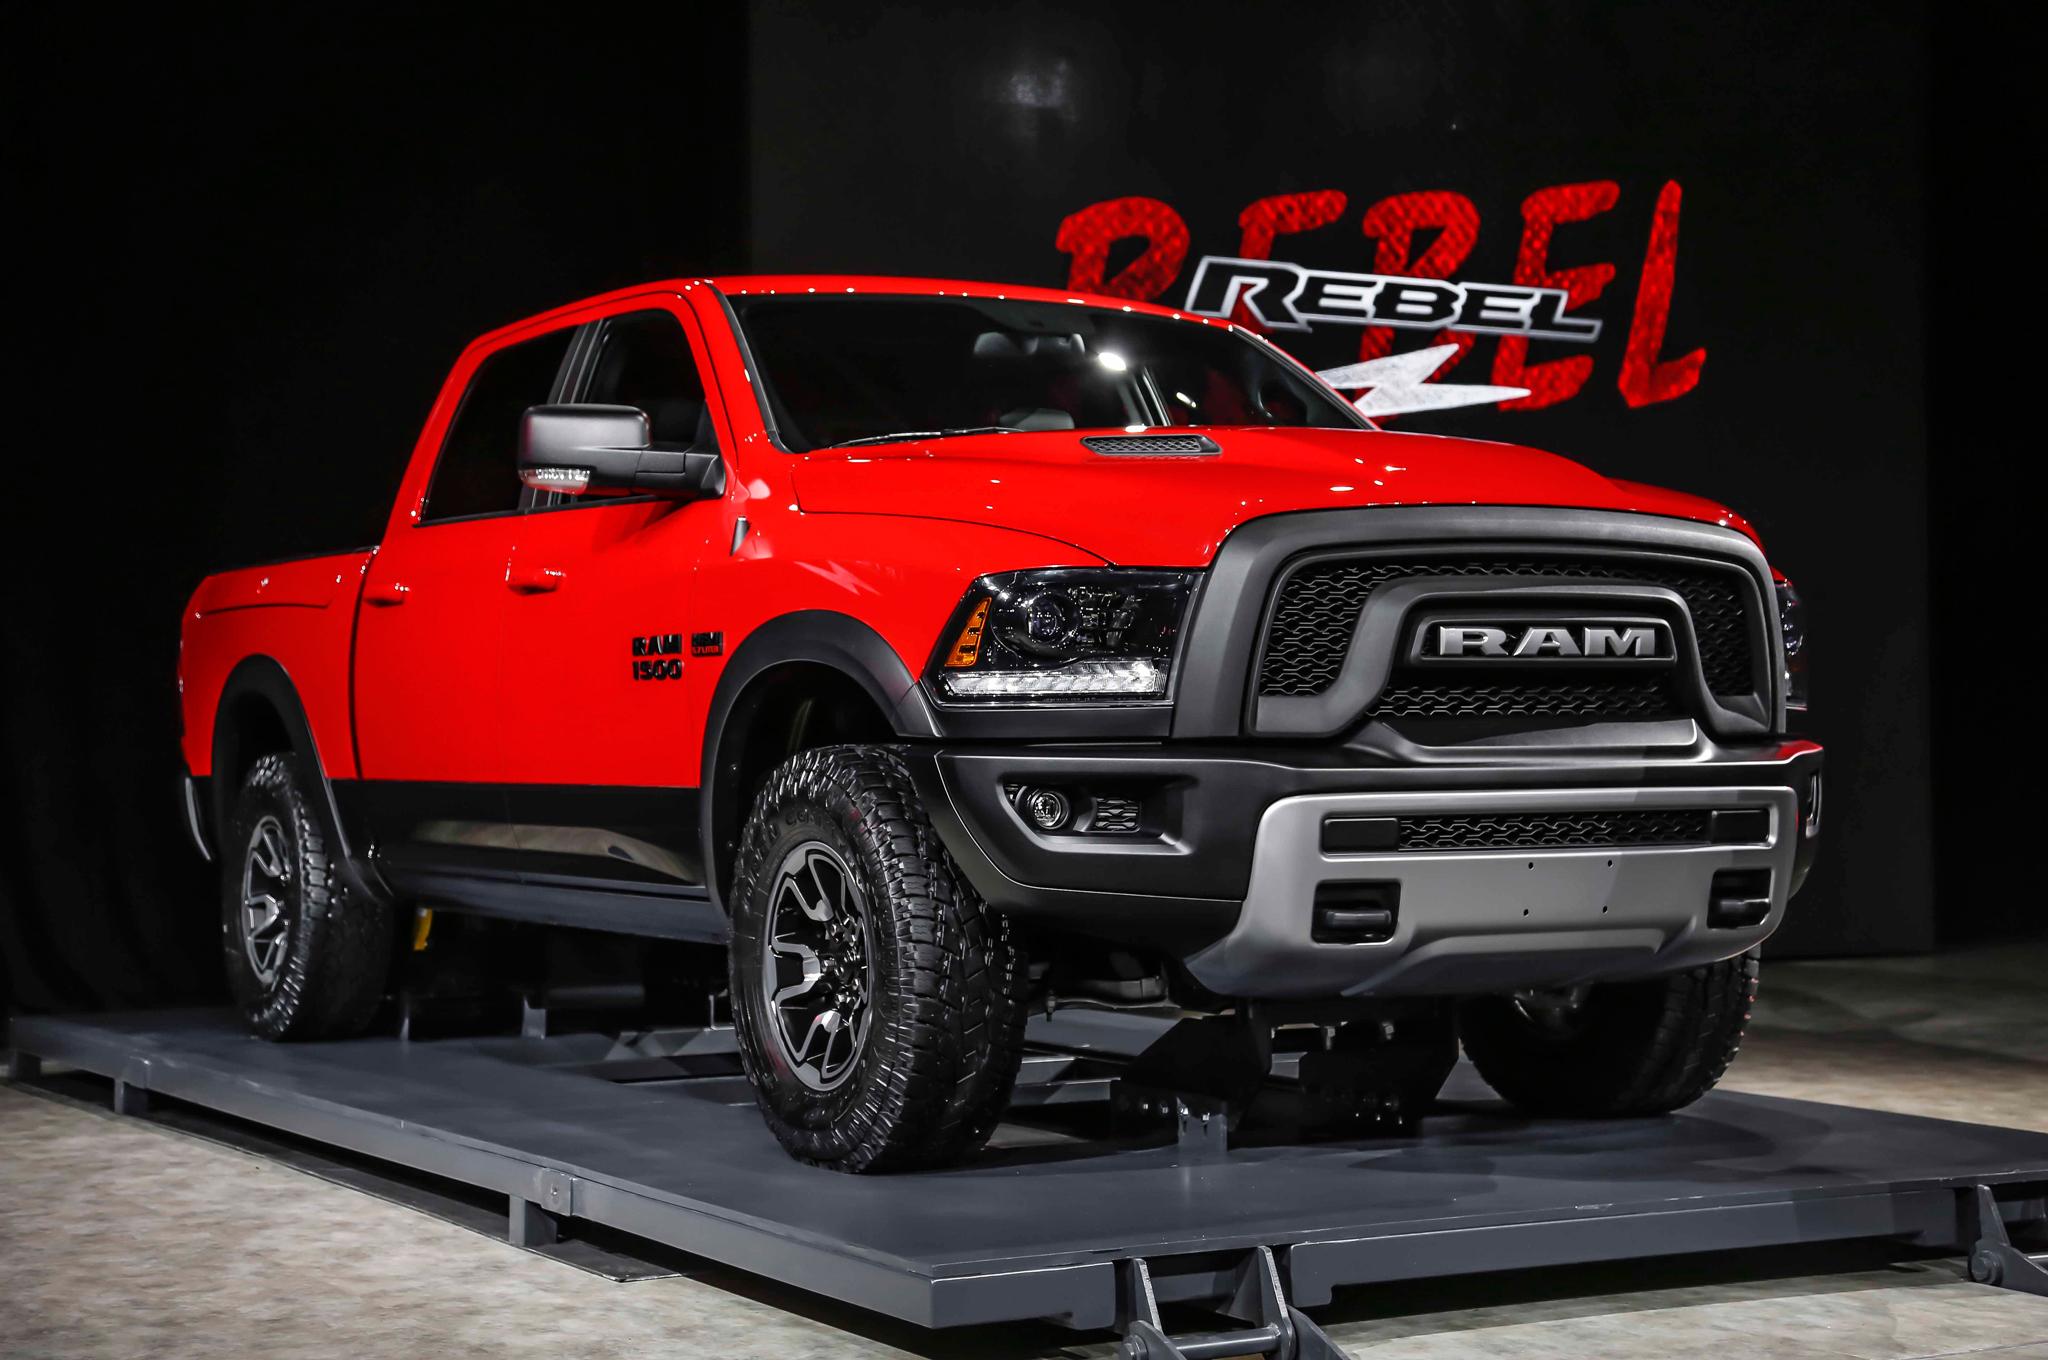 Dodge Ram 1500 Rebeltruck